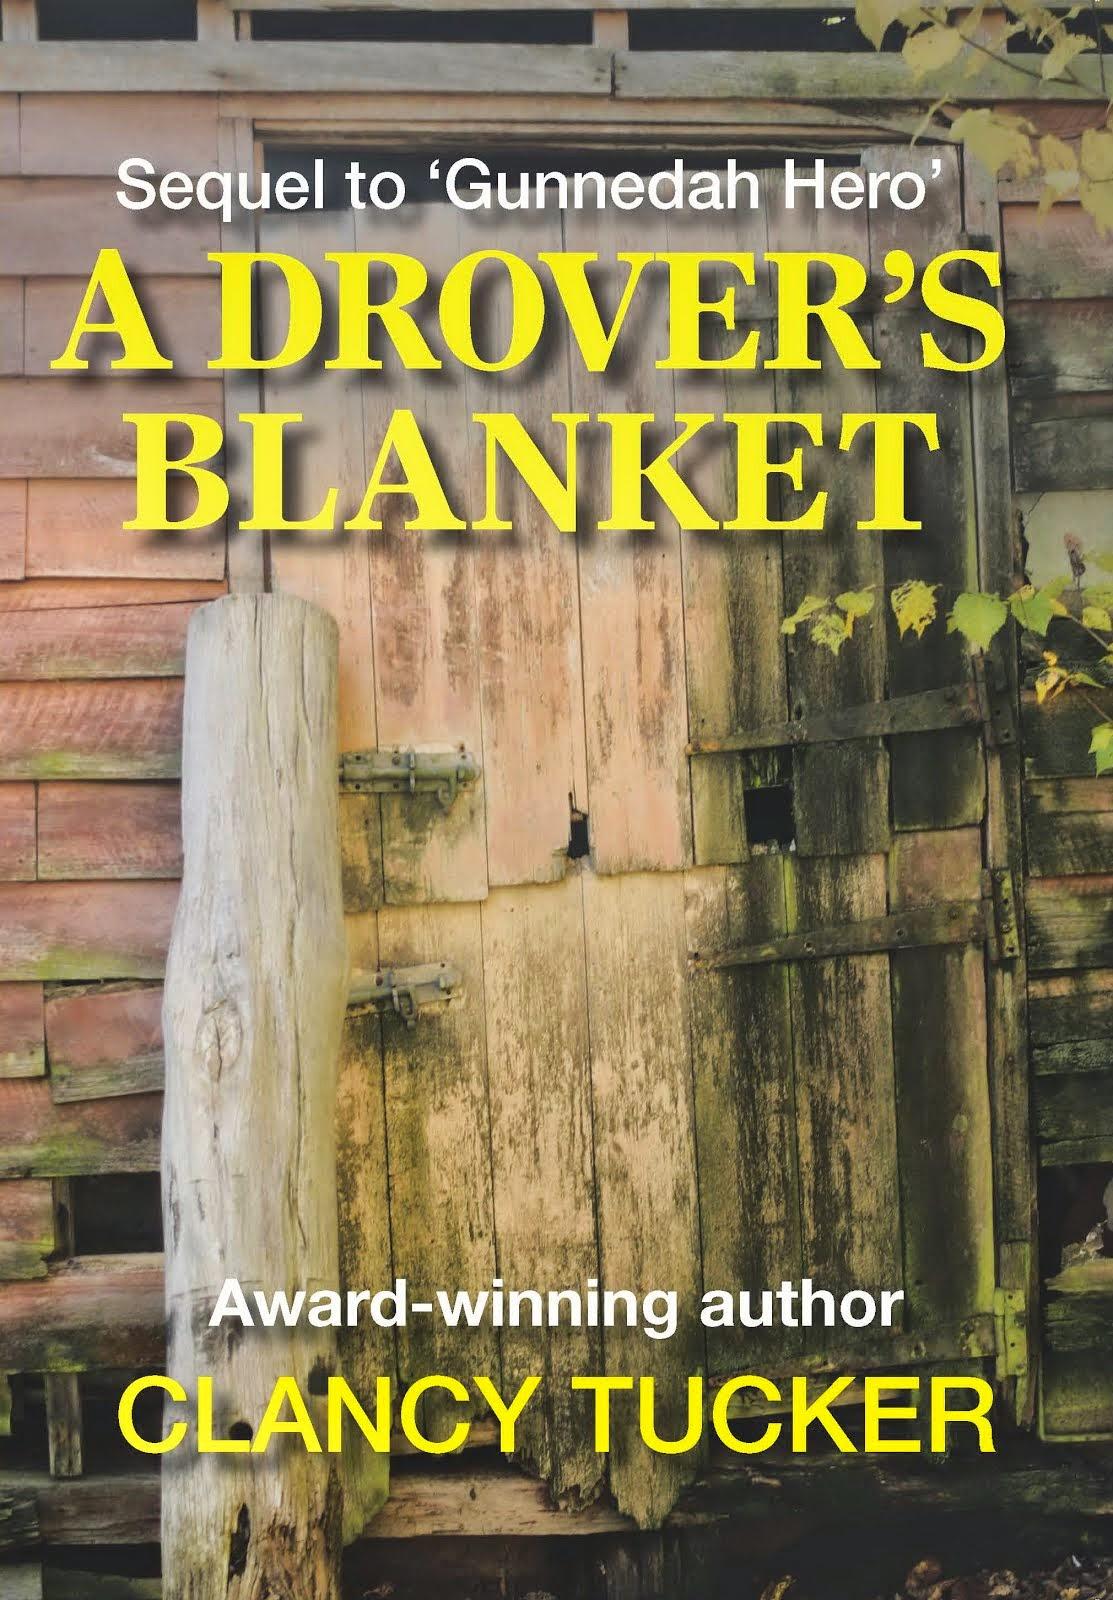 A DROVER'S BLANKET - AUSTRALIA